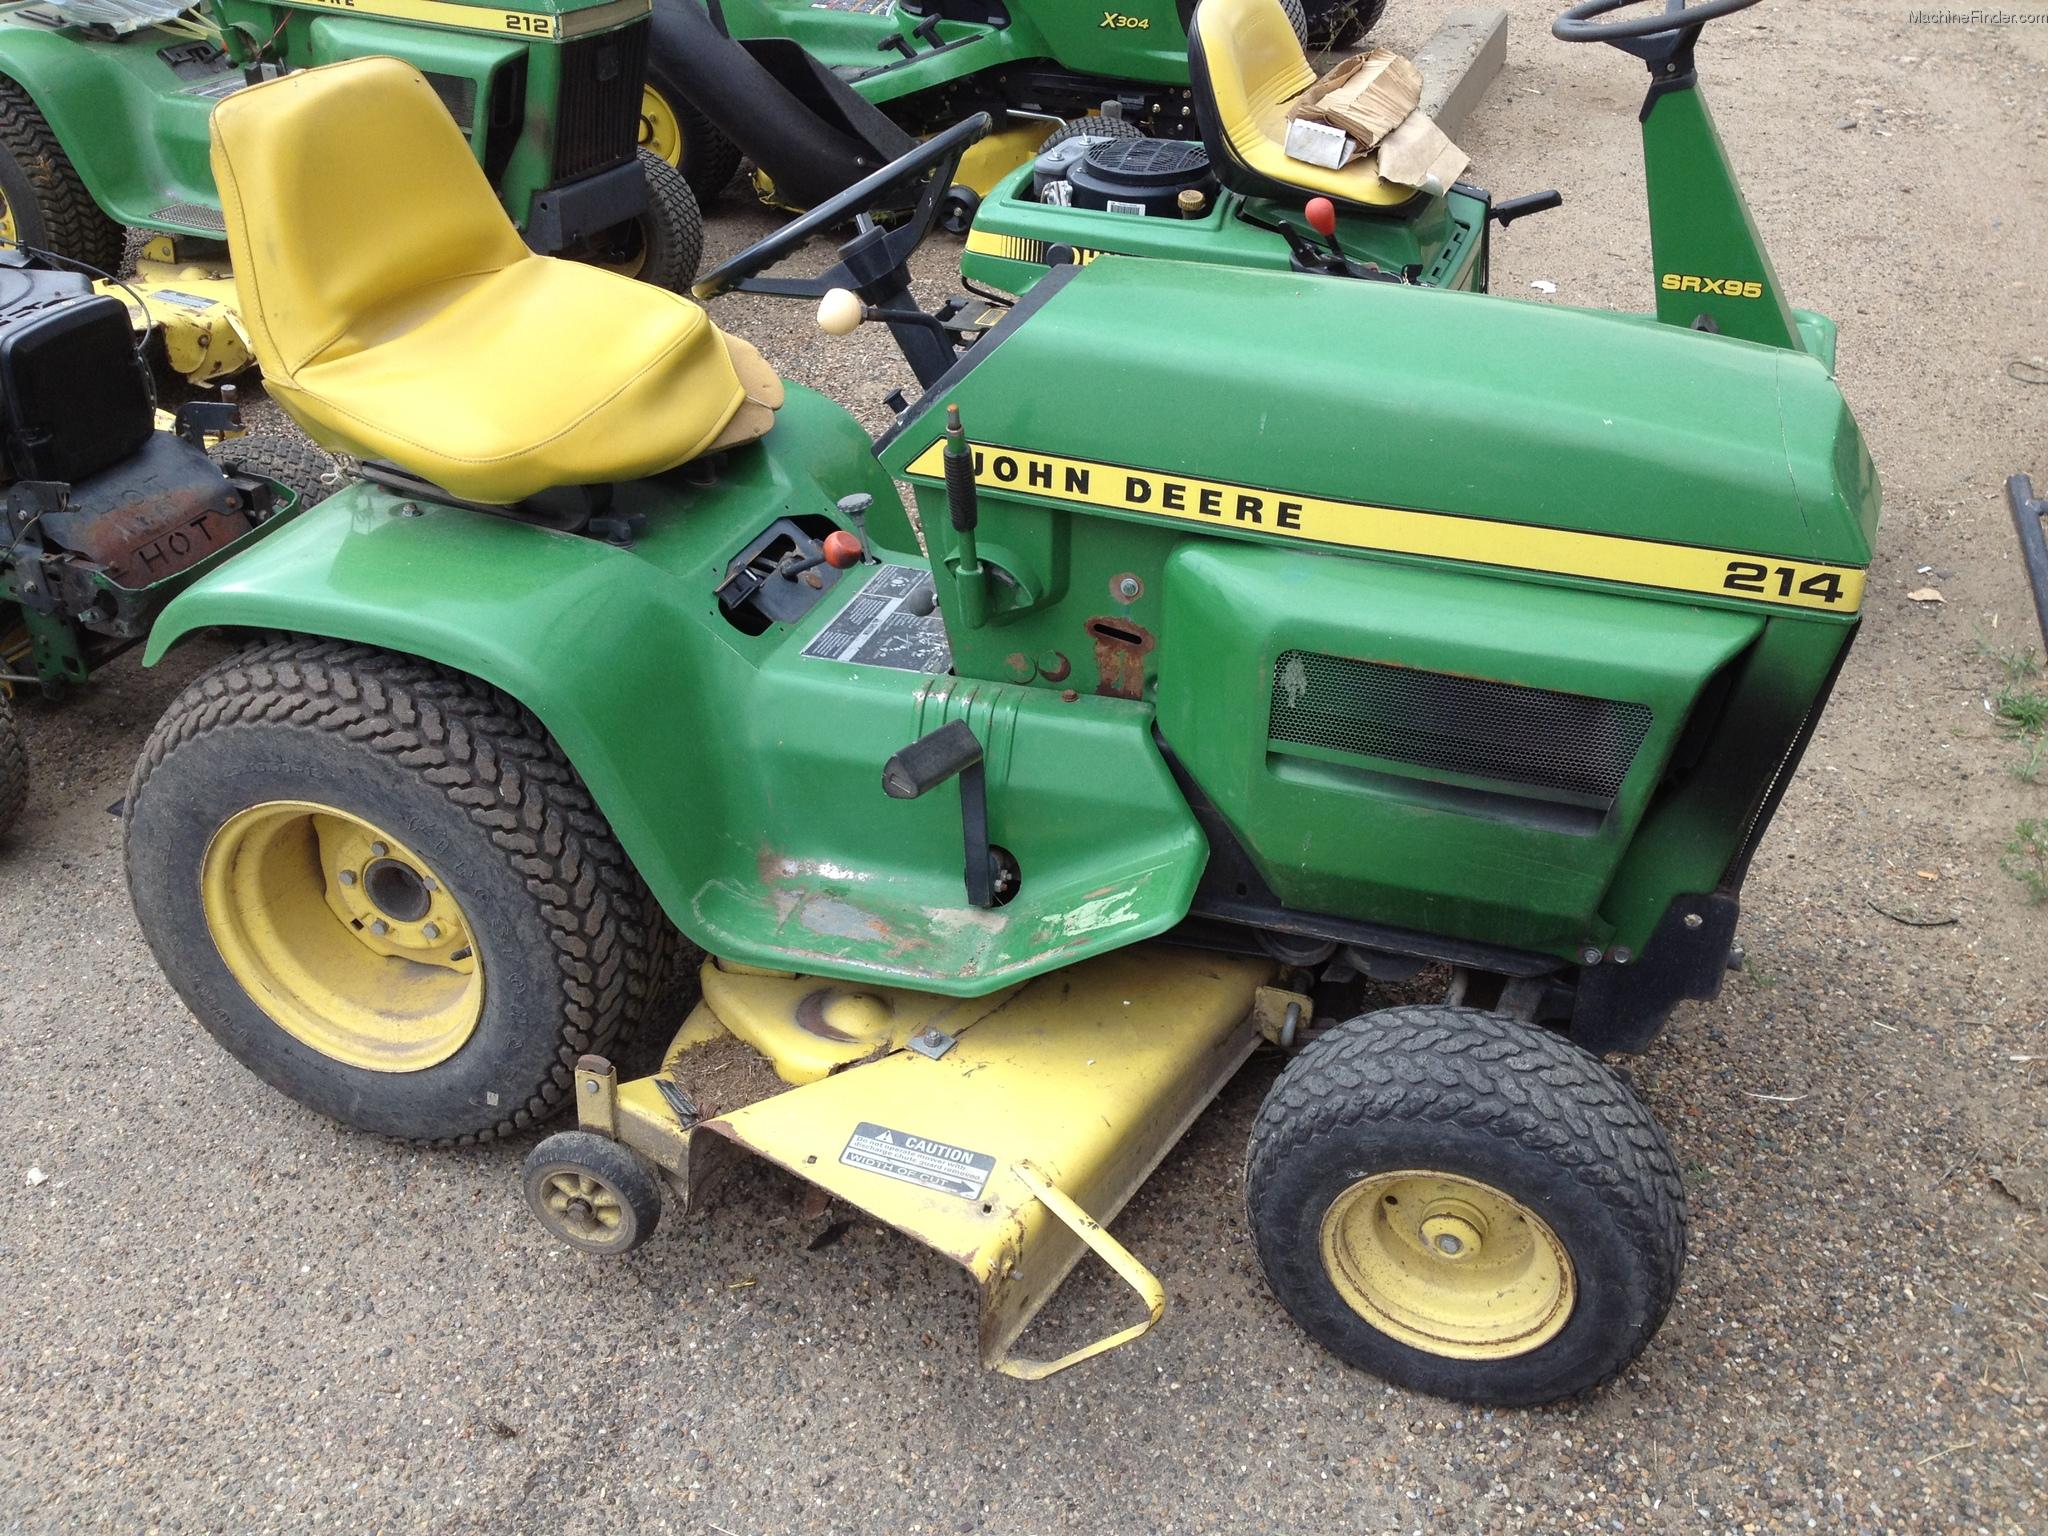 John Deere 214 Lawn Tractor Tractors 212 Wiring Harness